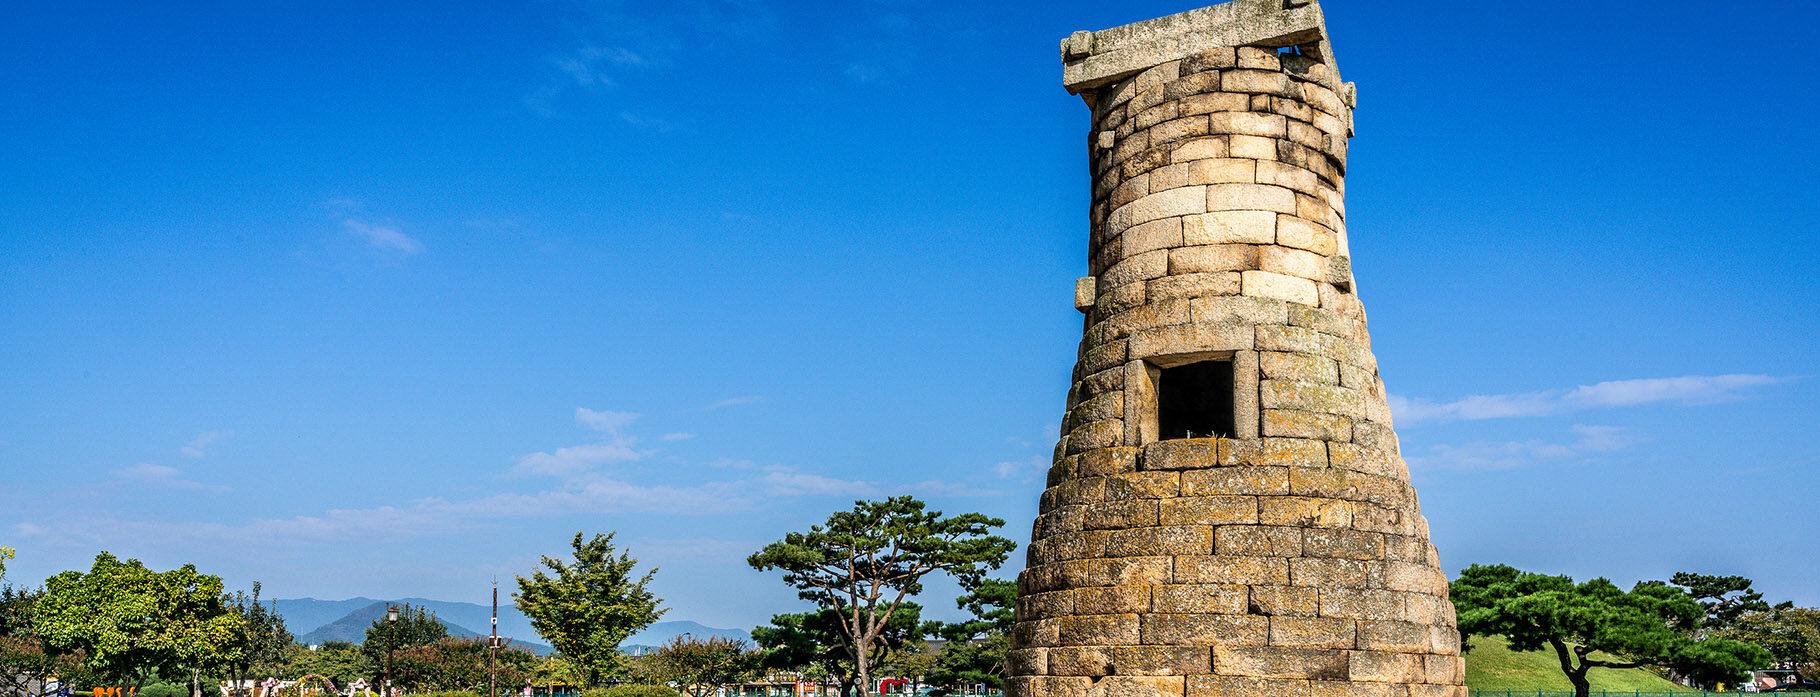 6 DAYS CULTURAL GYEONGSANG IN KOREA